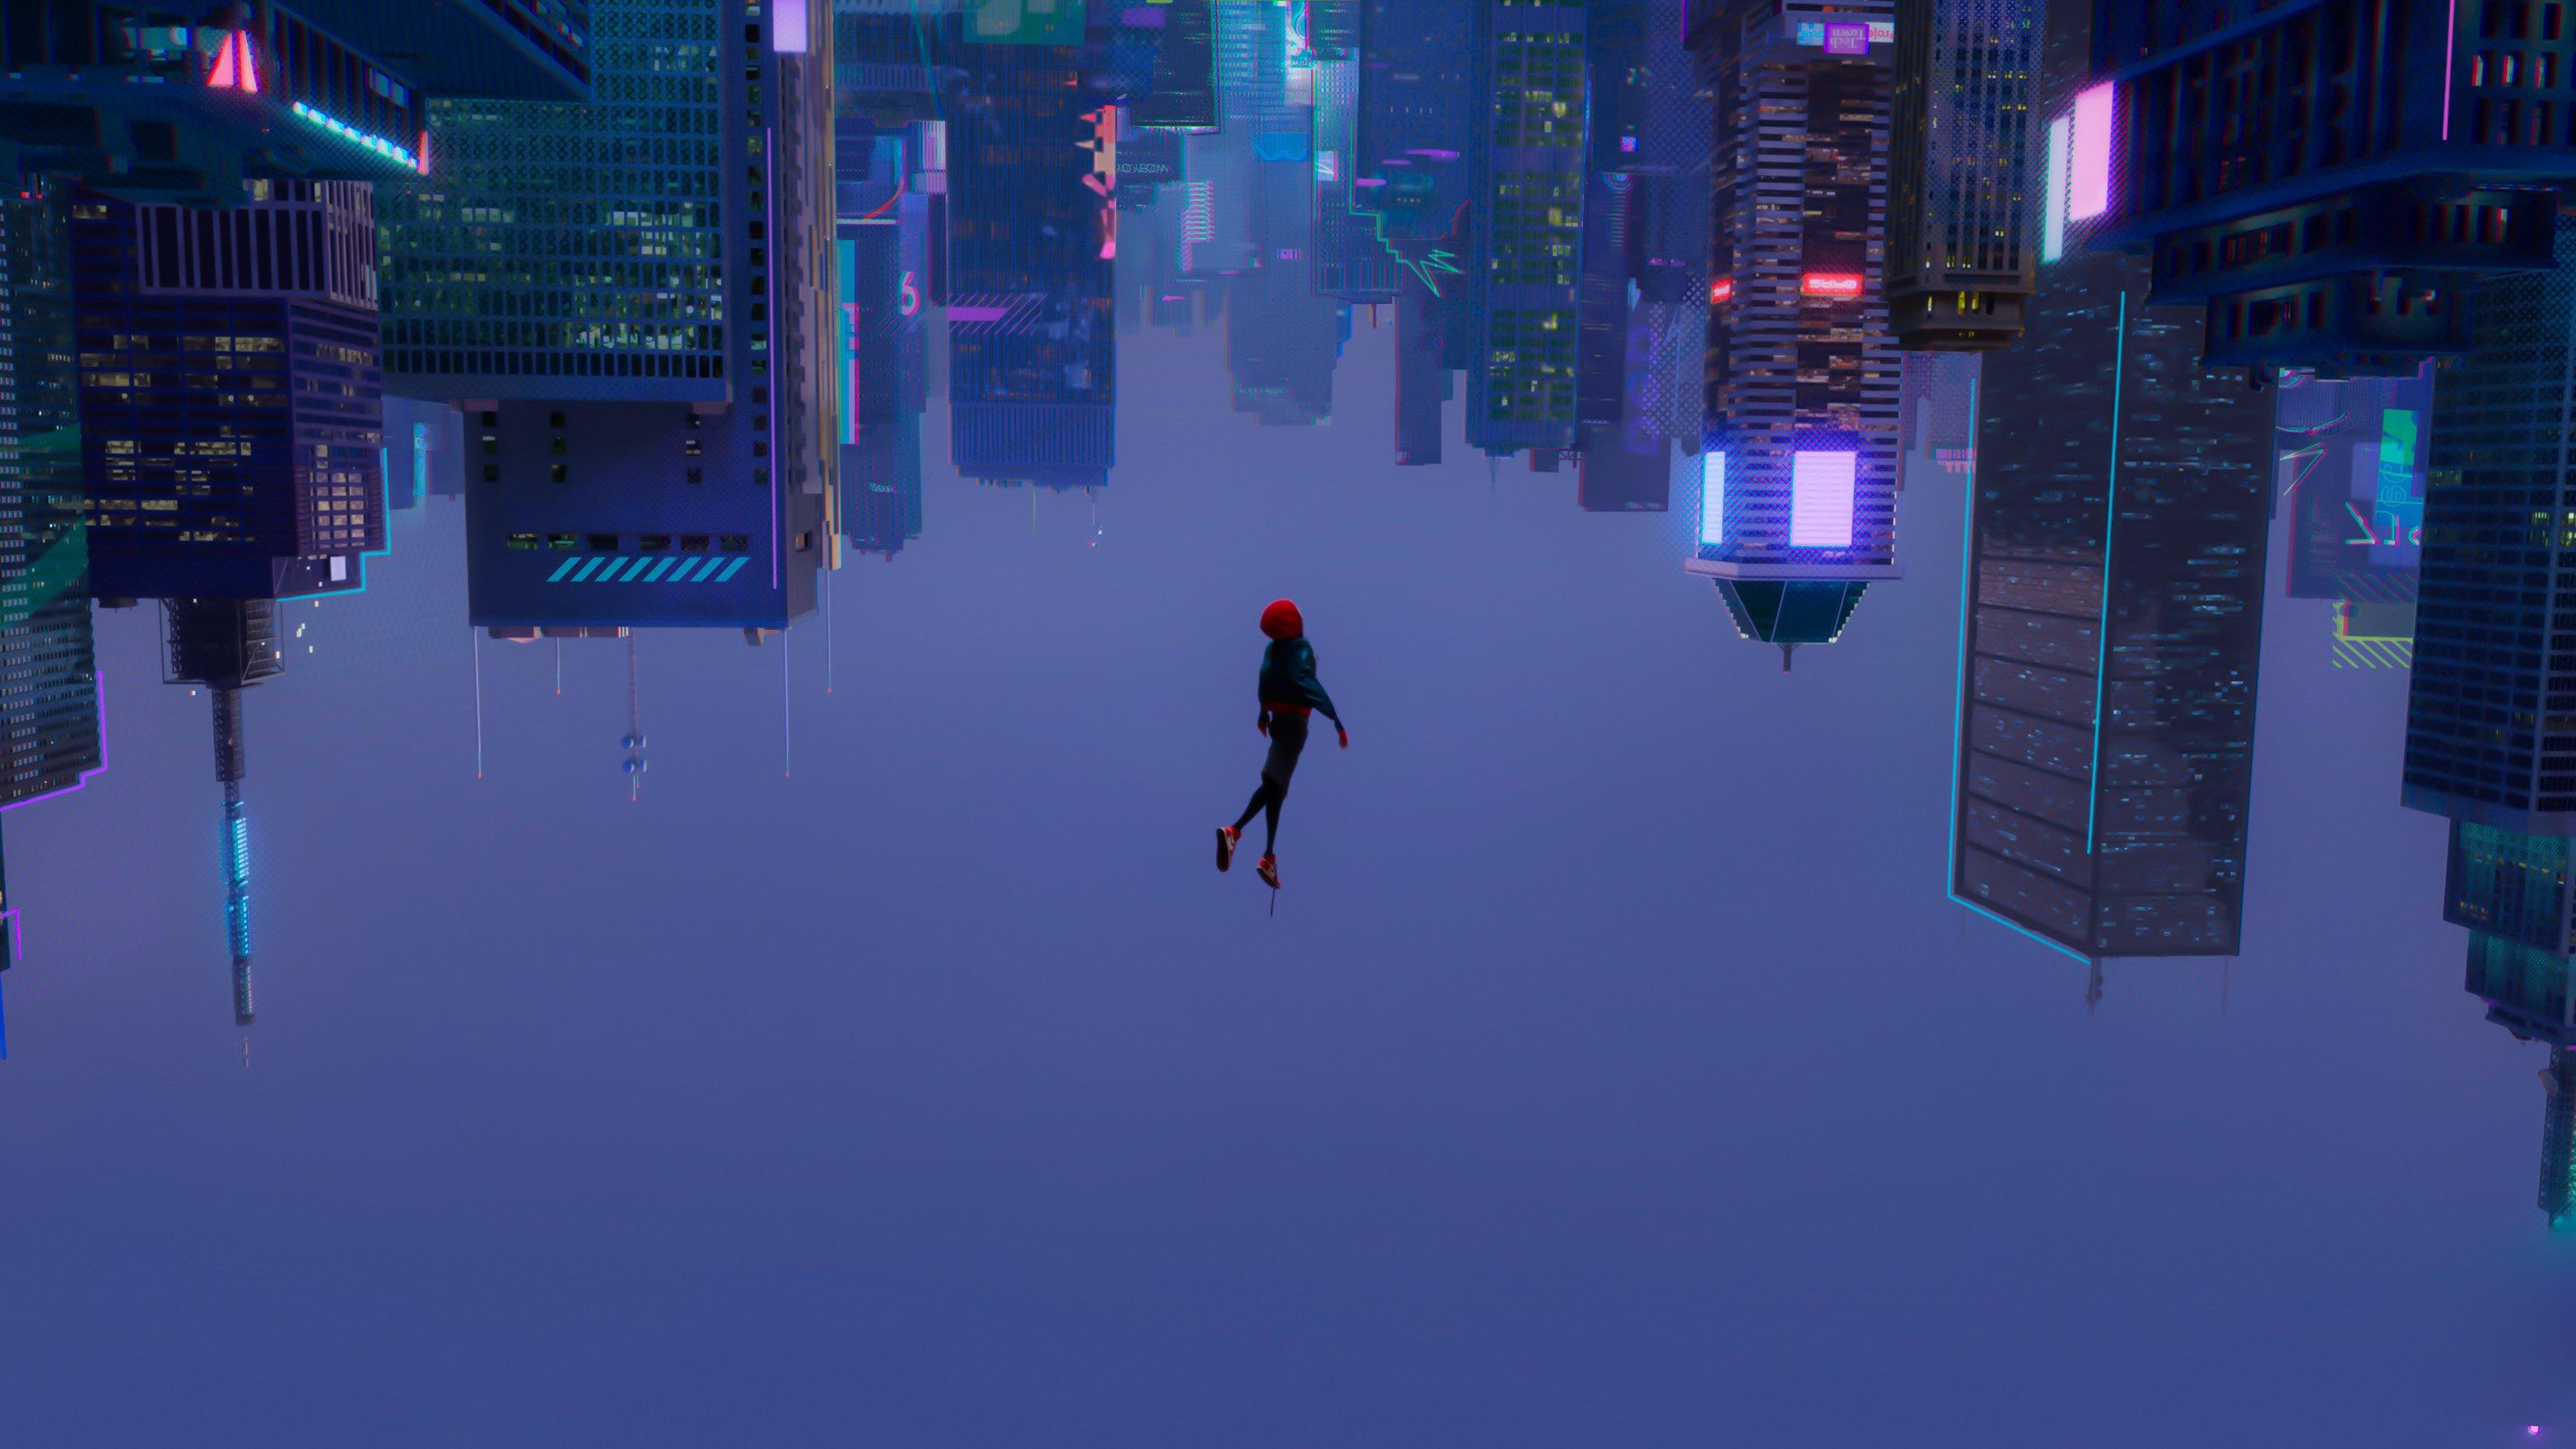 Galaxy S5 Fall Wallpaper Spider Man Into The Spider Verse Hd Wallpaper